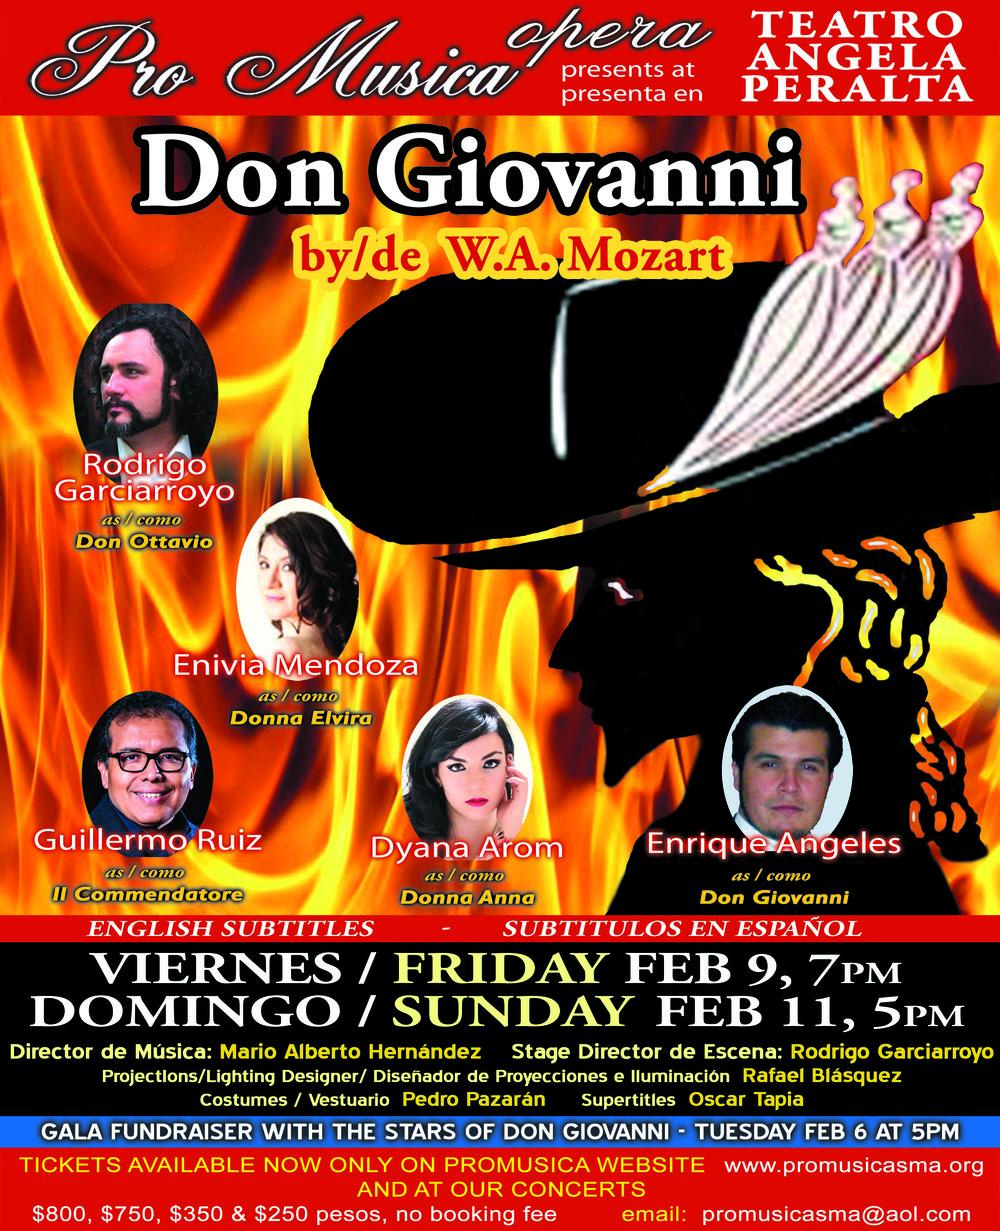 promusica - Don Giovanni 18.jpg